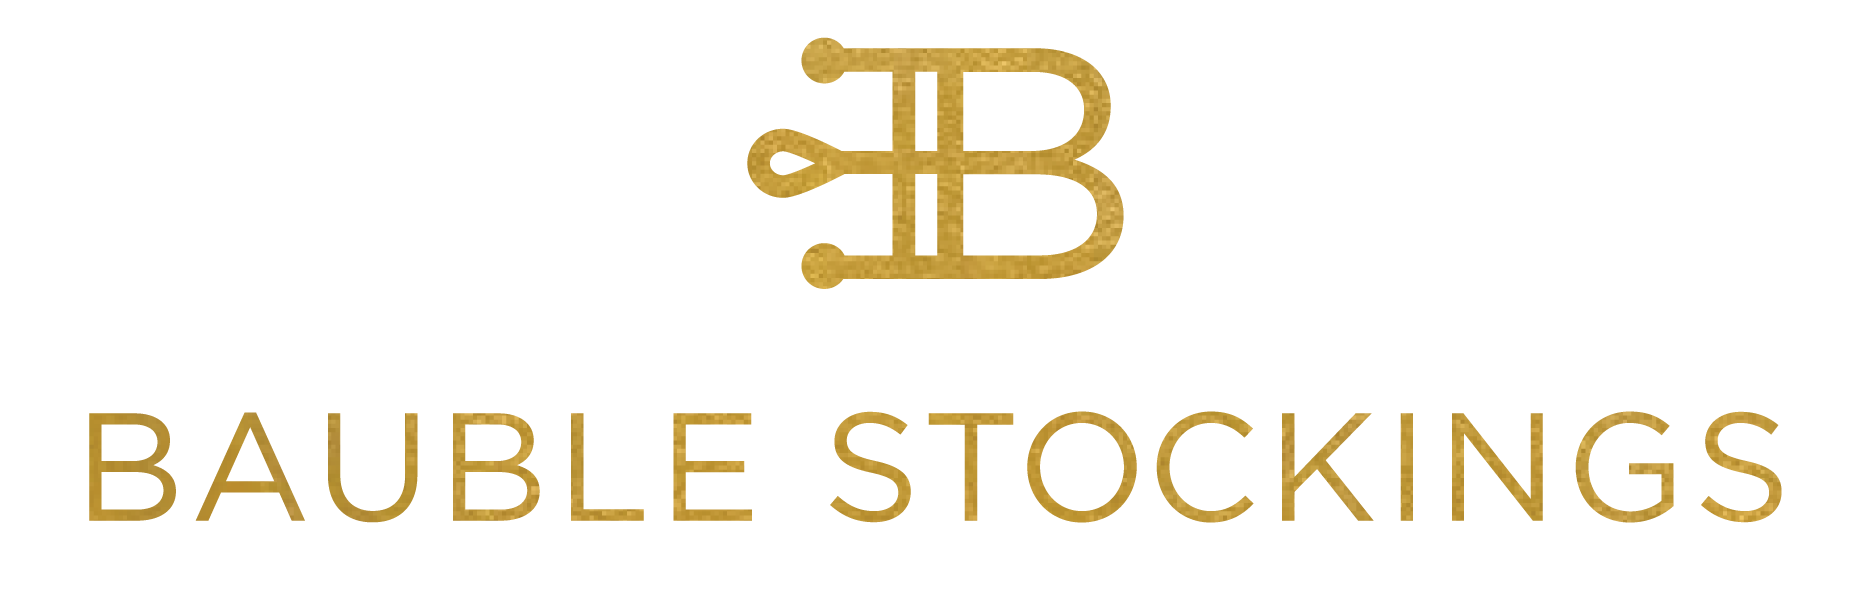 Bauble Stockings logo